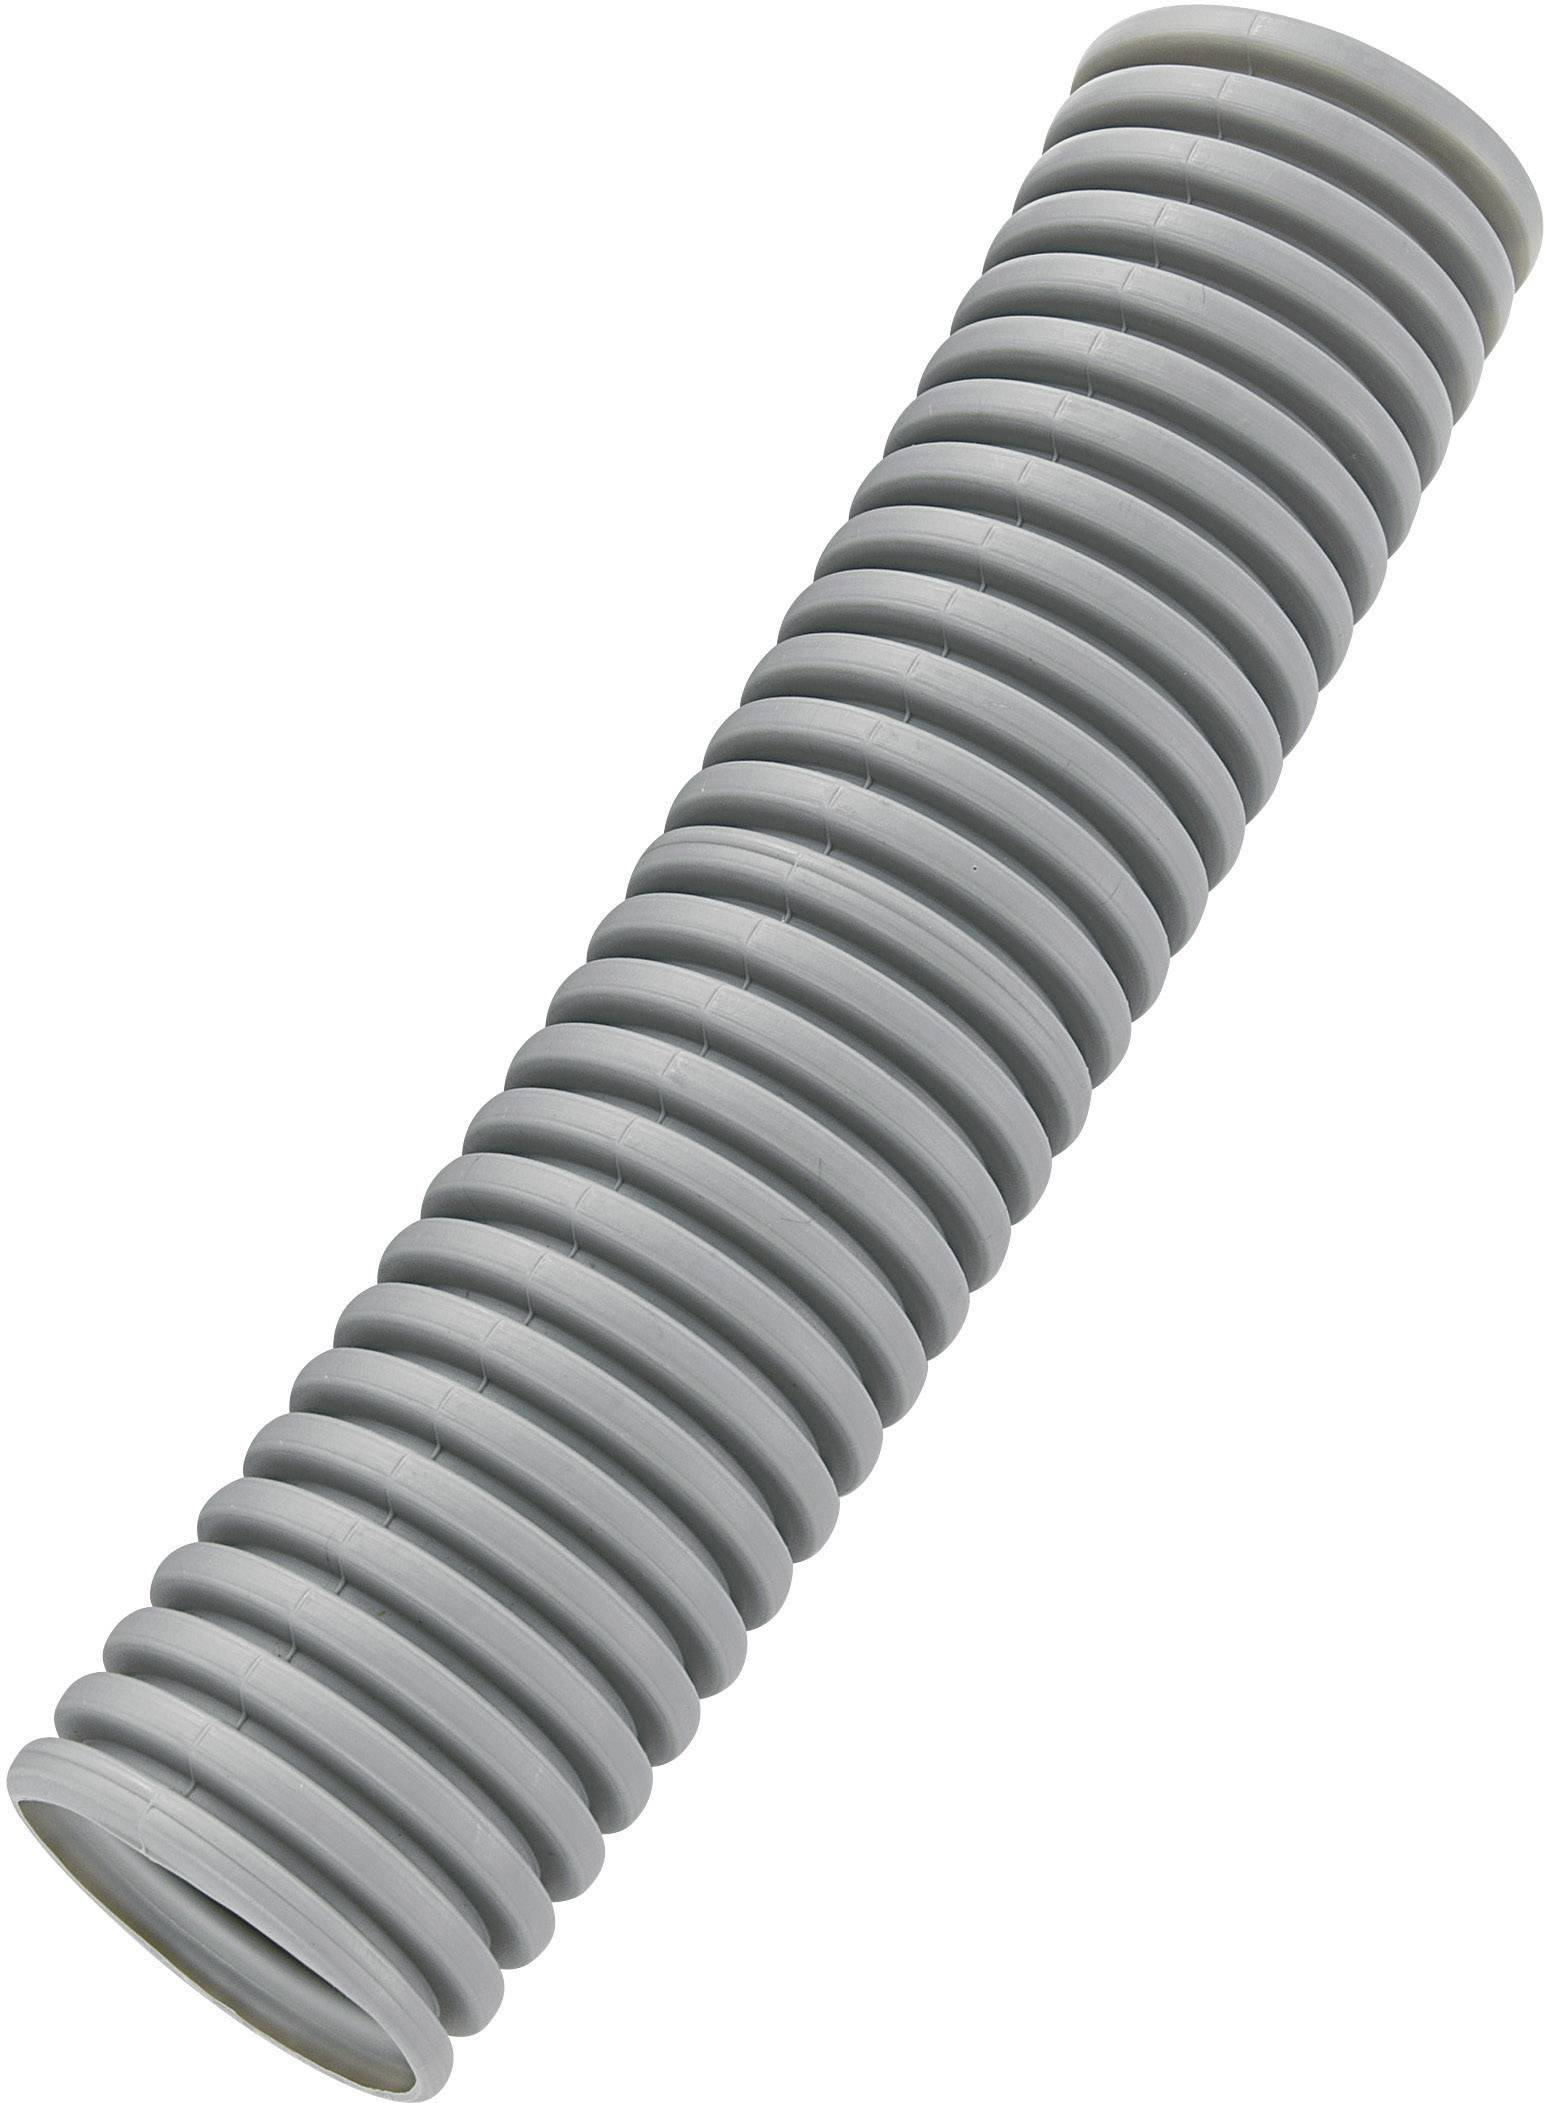 Husí krk KSS BGR20P, 20 mm, šedá